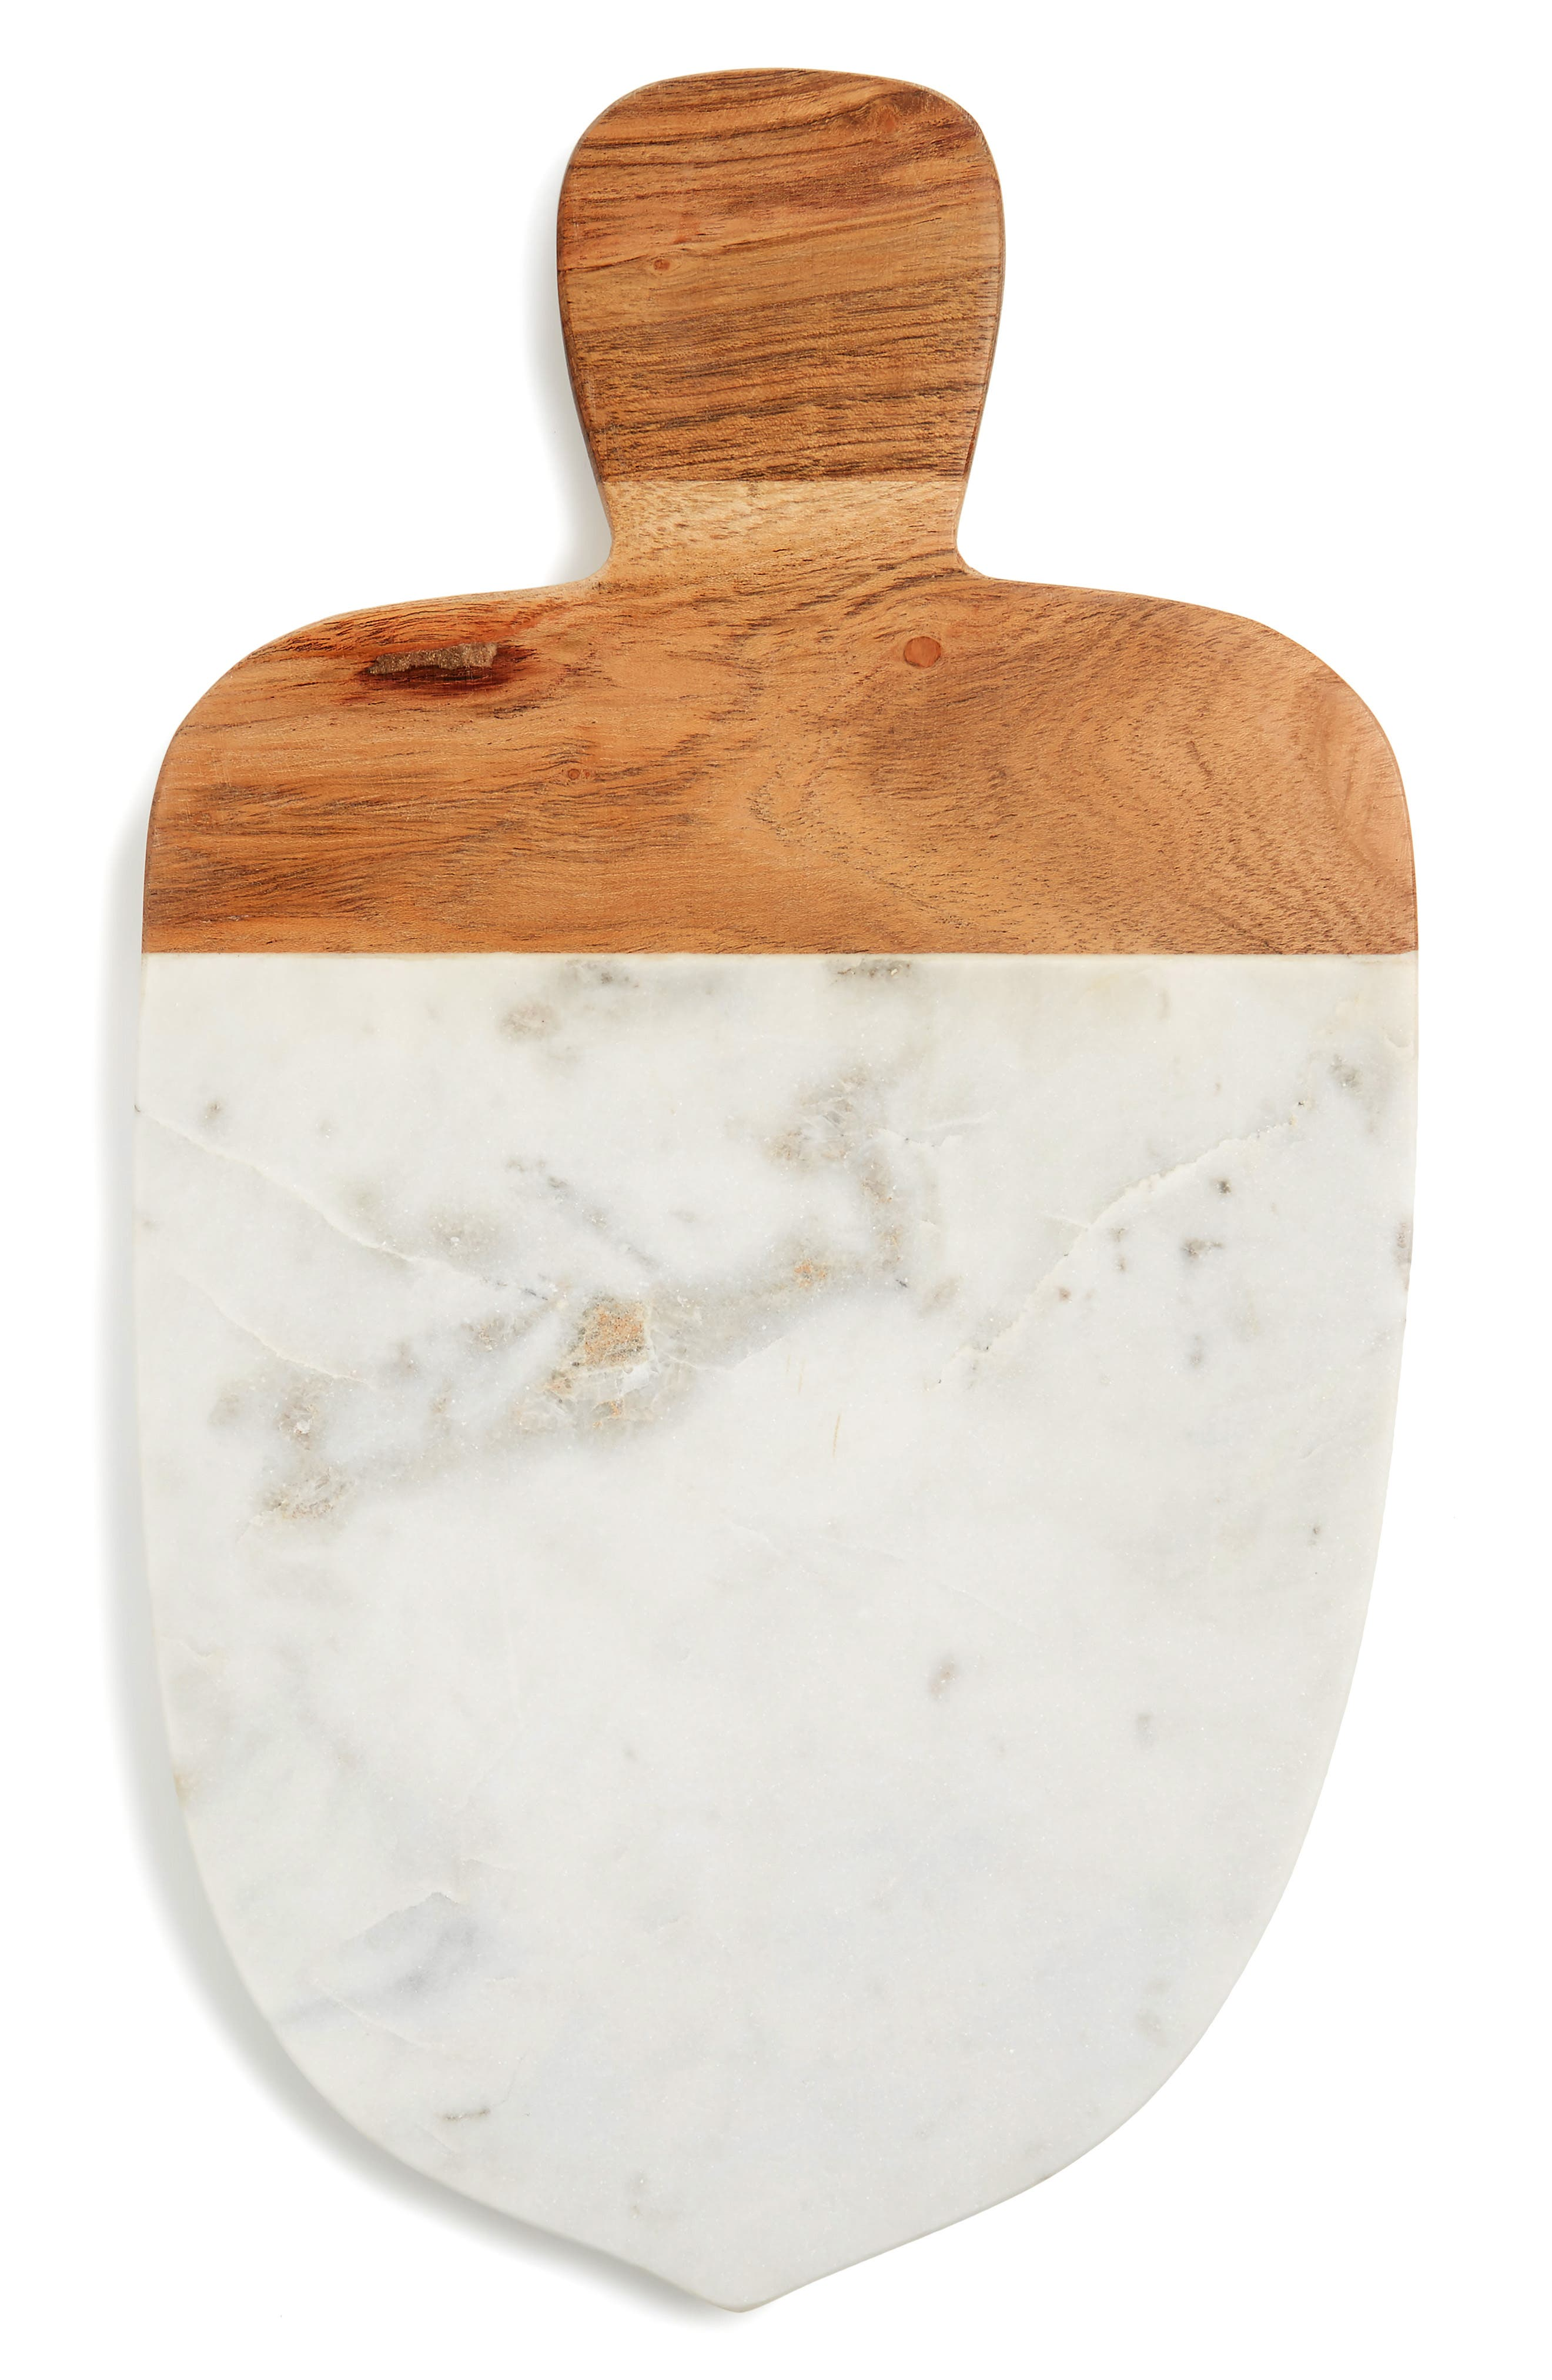 Marble Acorn Cutting Board,                             Main thumbnail 1, color,